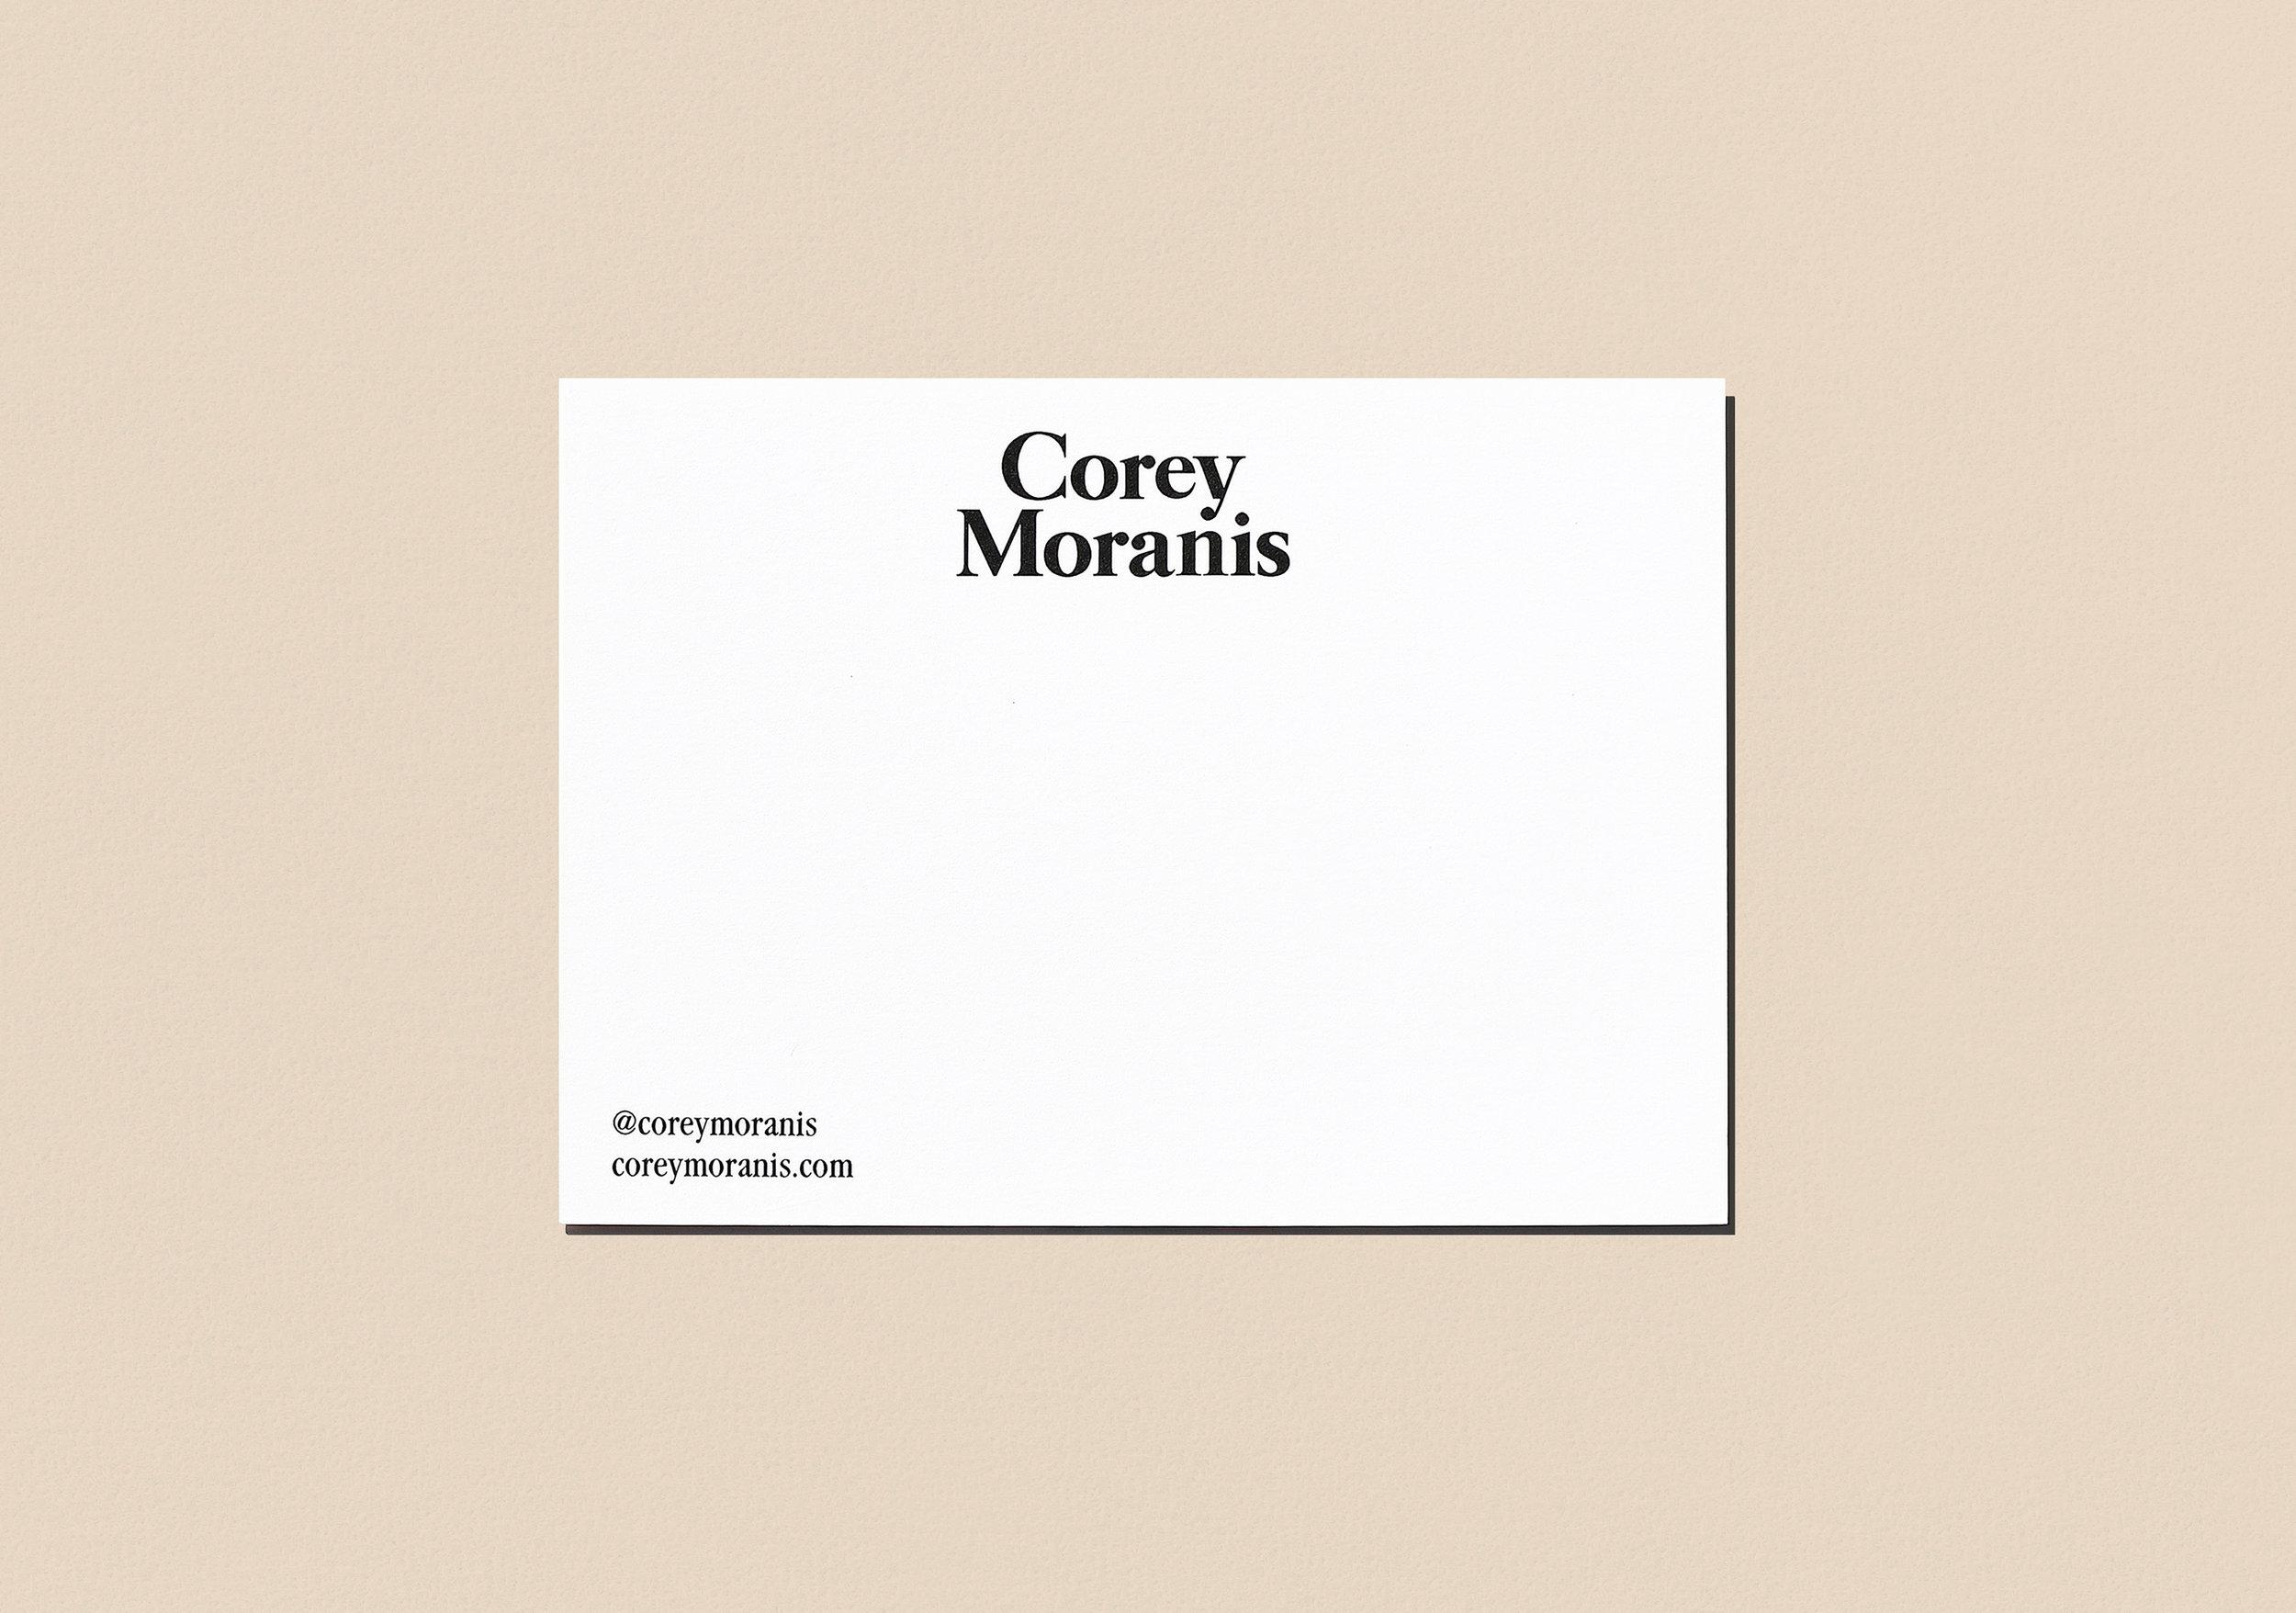 Corey_Moranis_Branding_Post_Card_Shadow